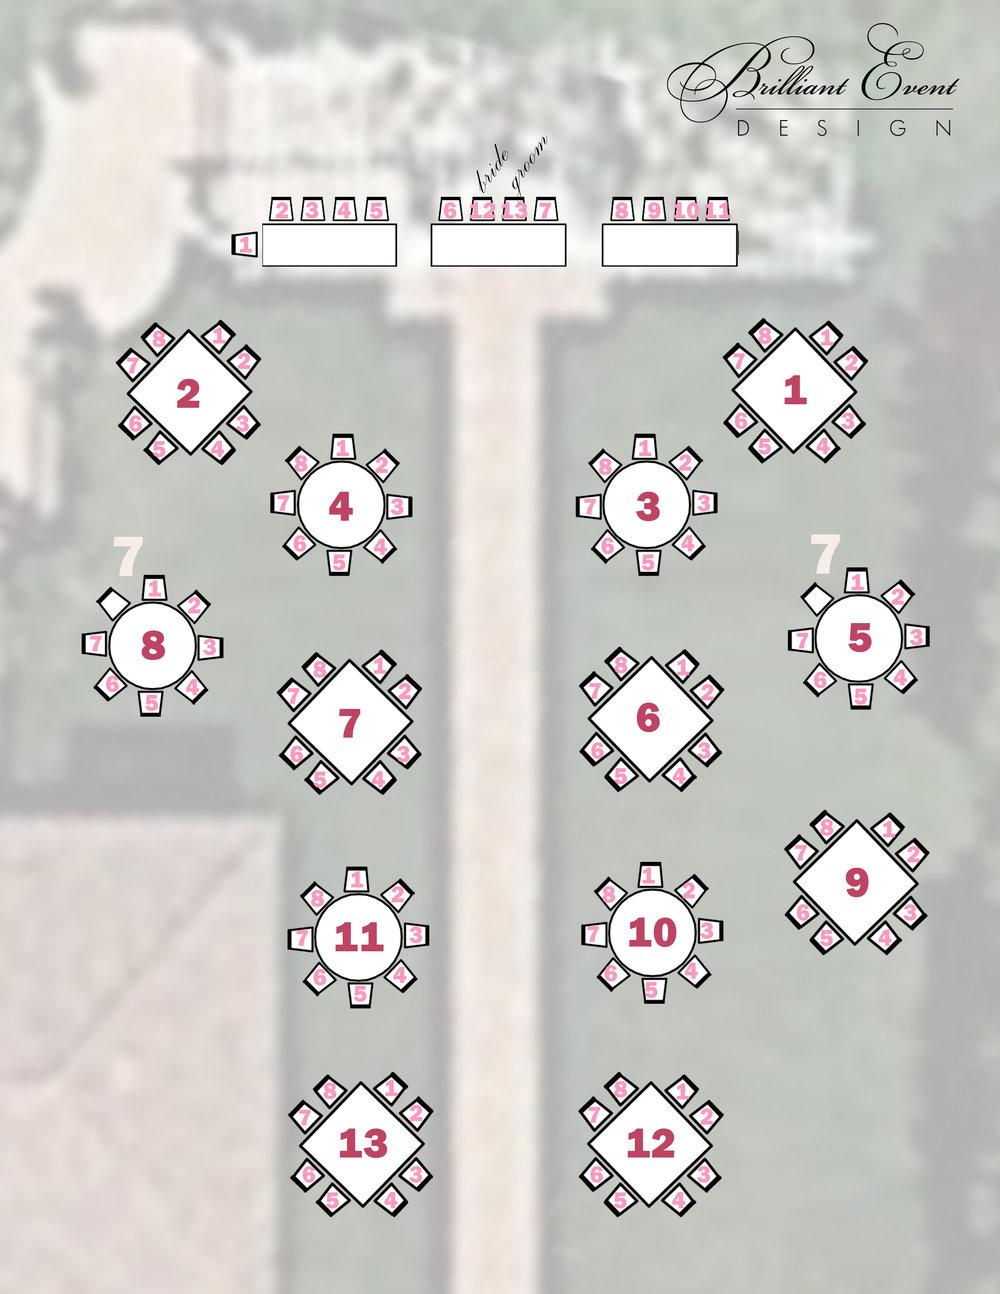 Leah & Tyler Wedding - Villa de Amore reception layout.jpg